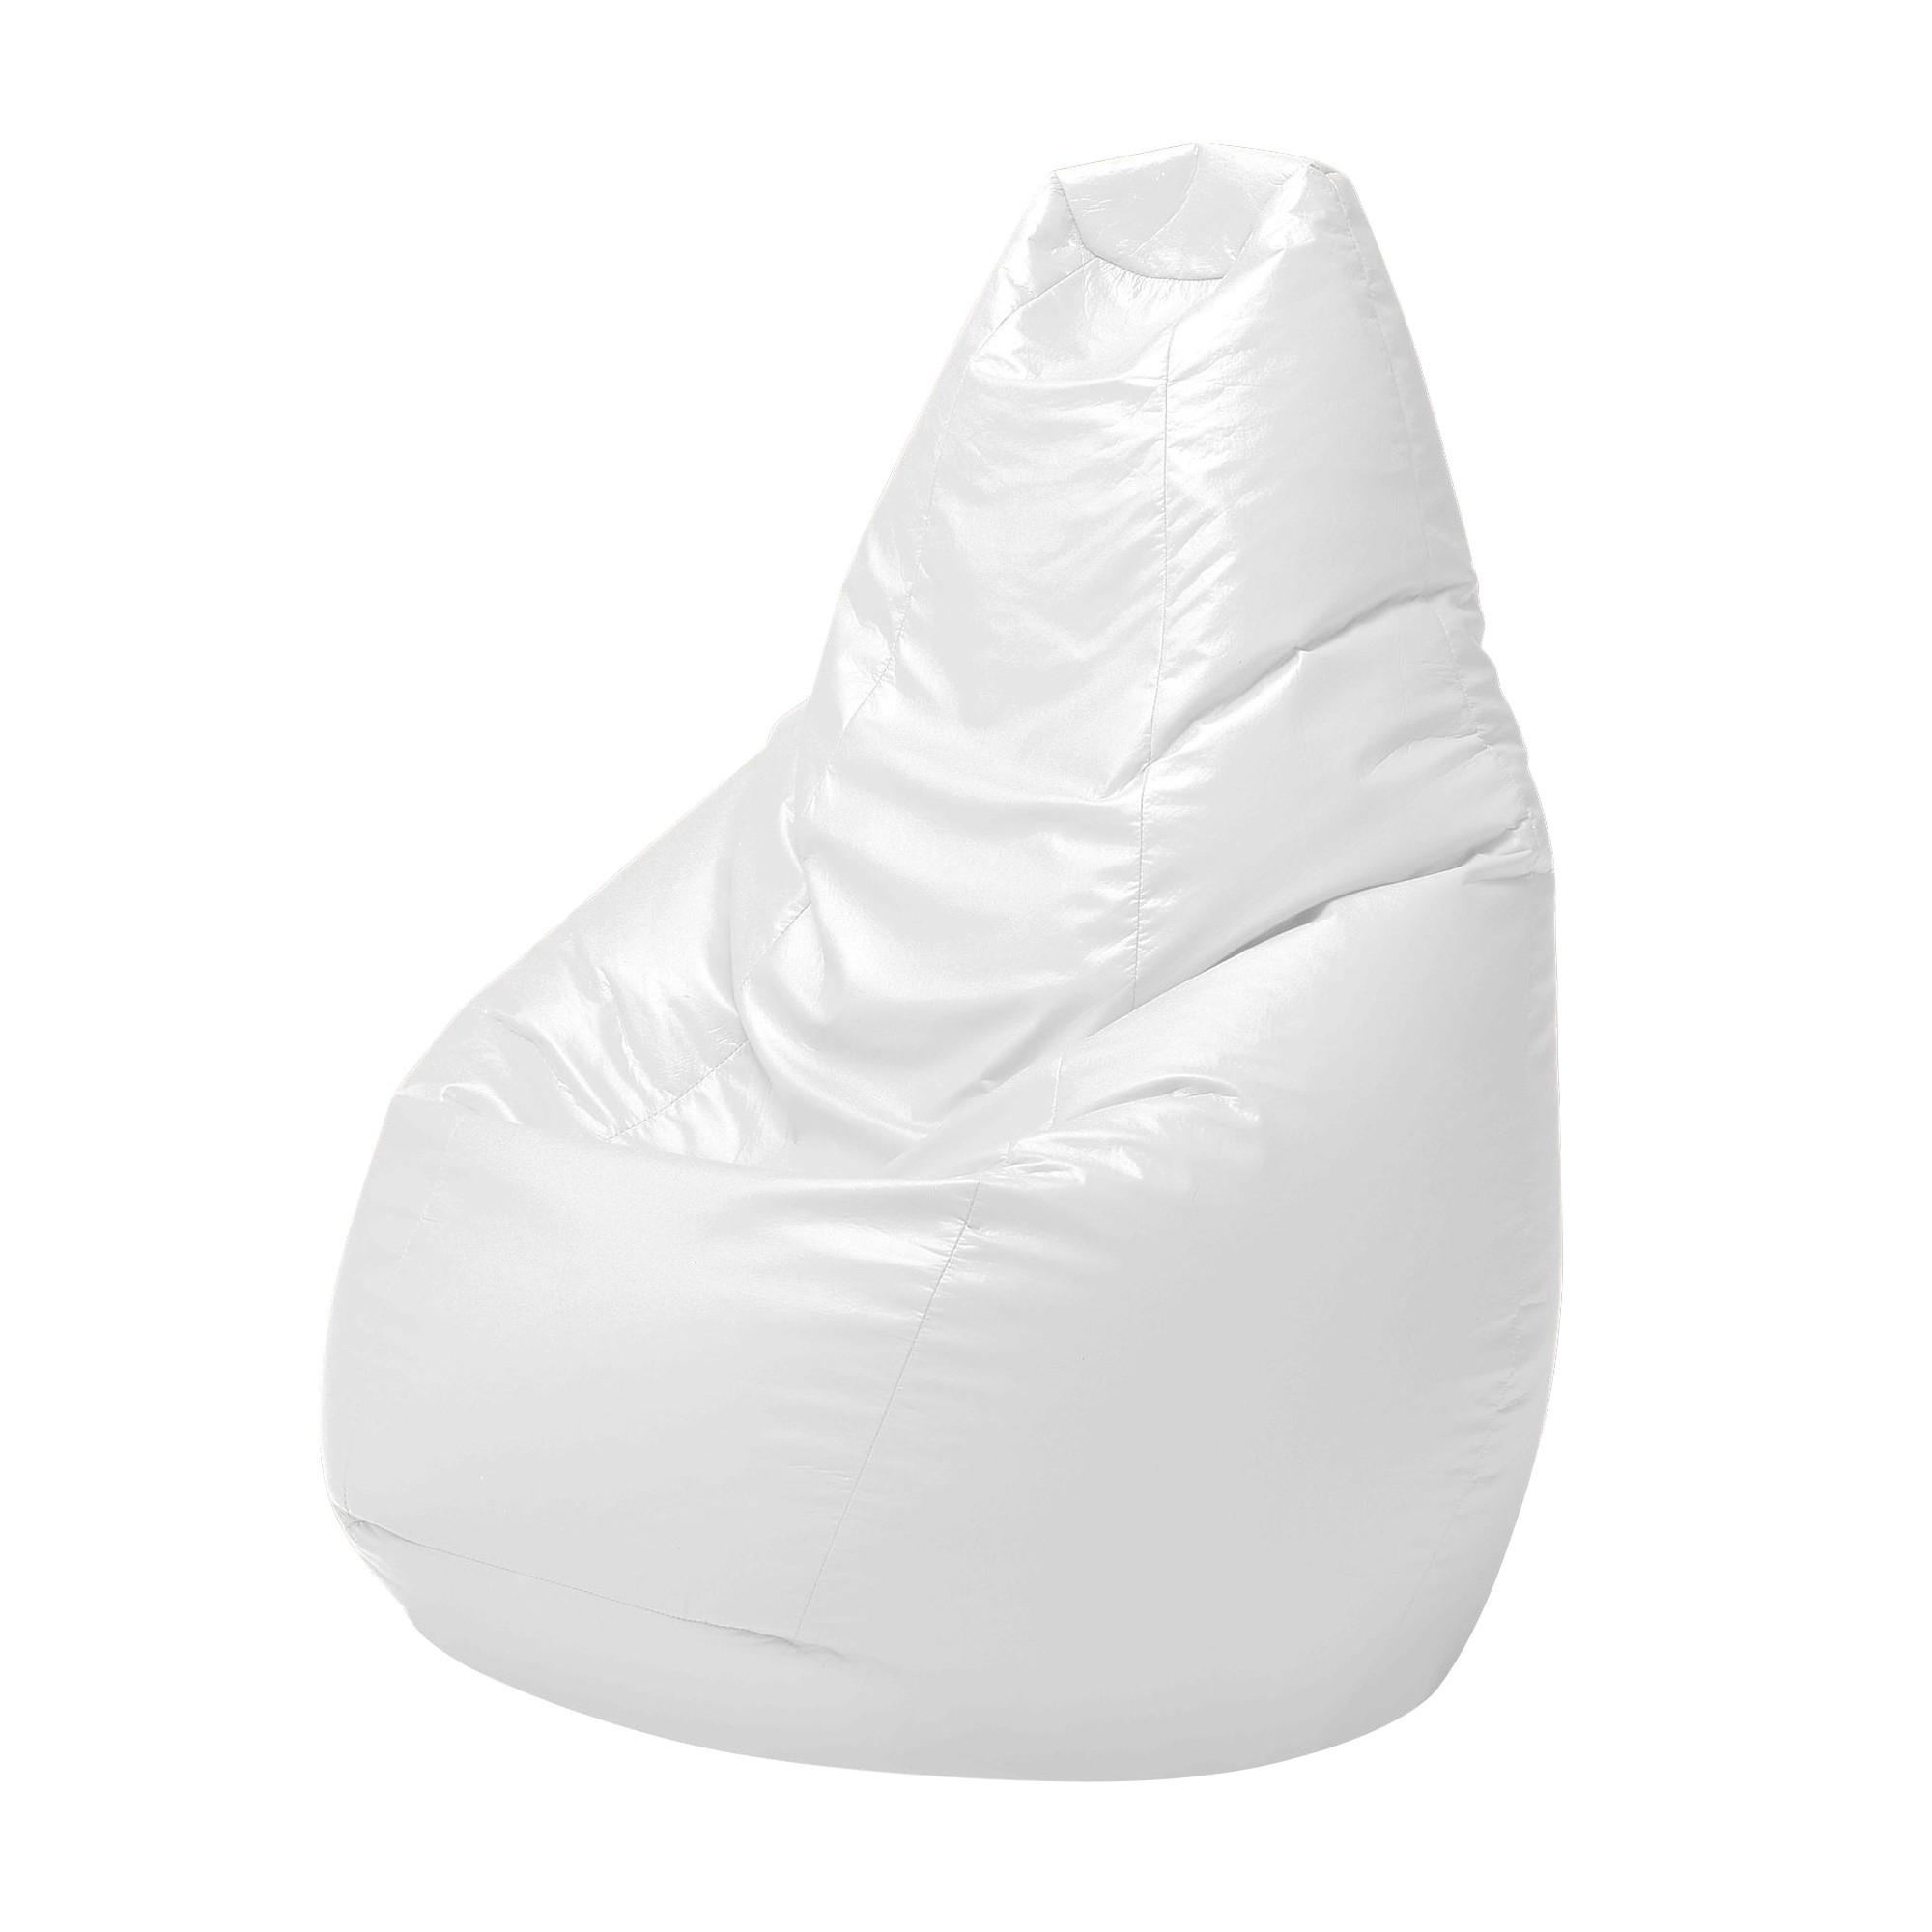 Zanotta Sacco Bean Bag Clic White Synthetic Leather